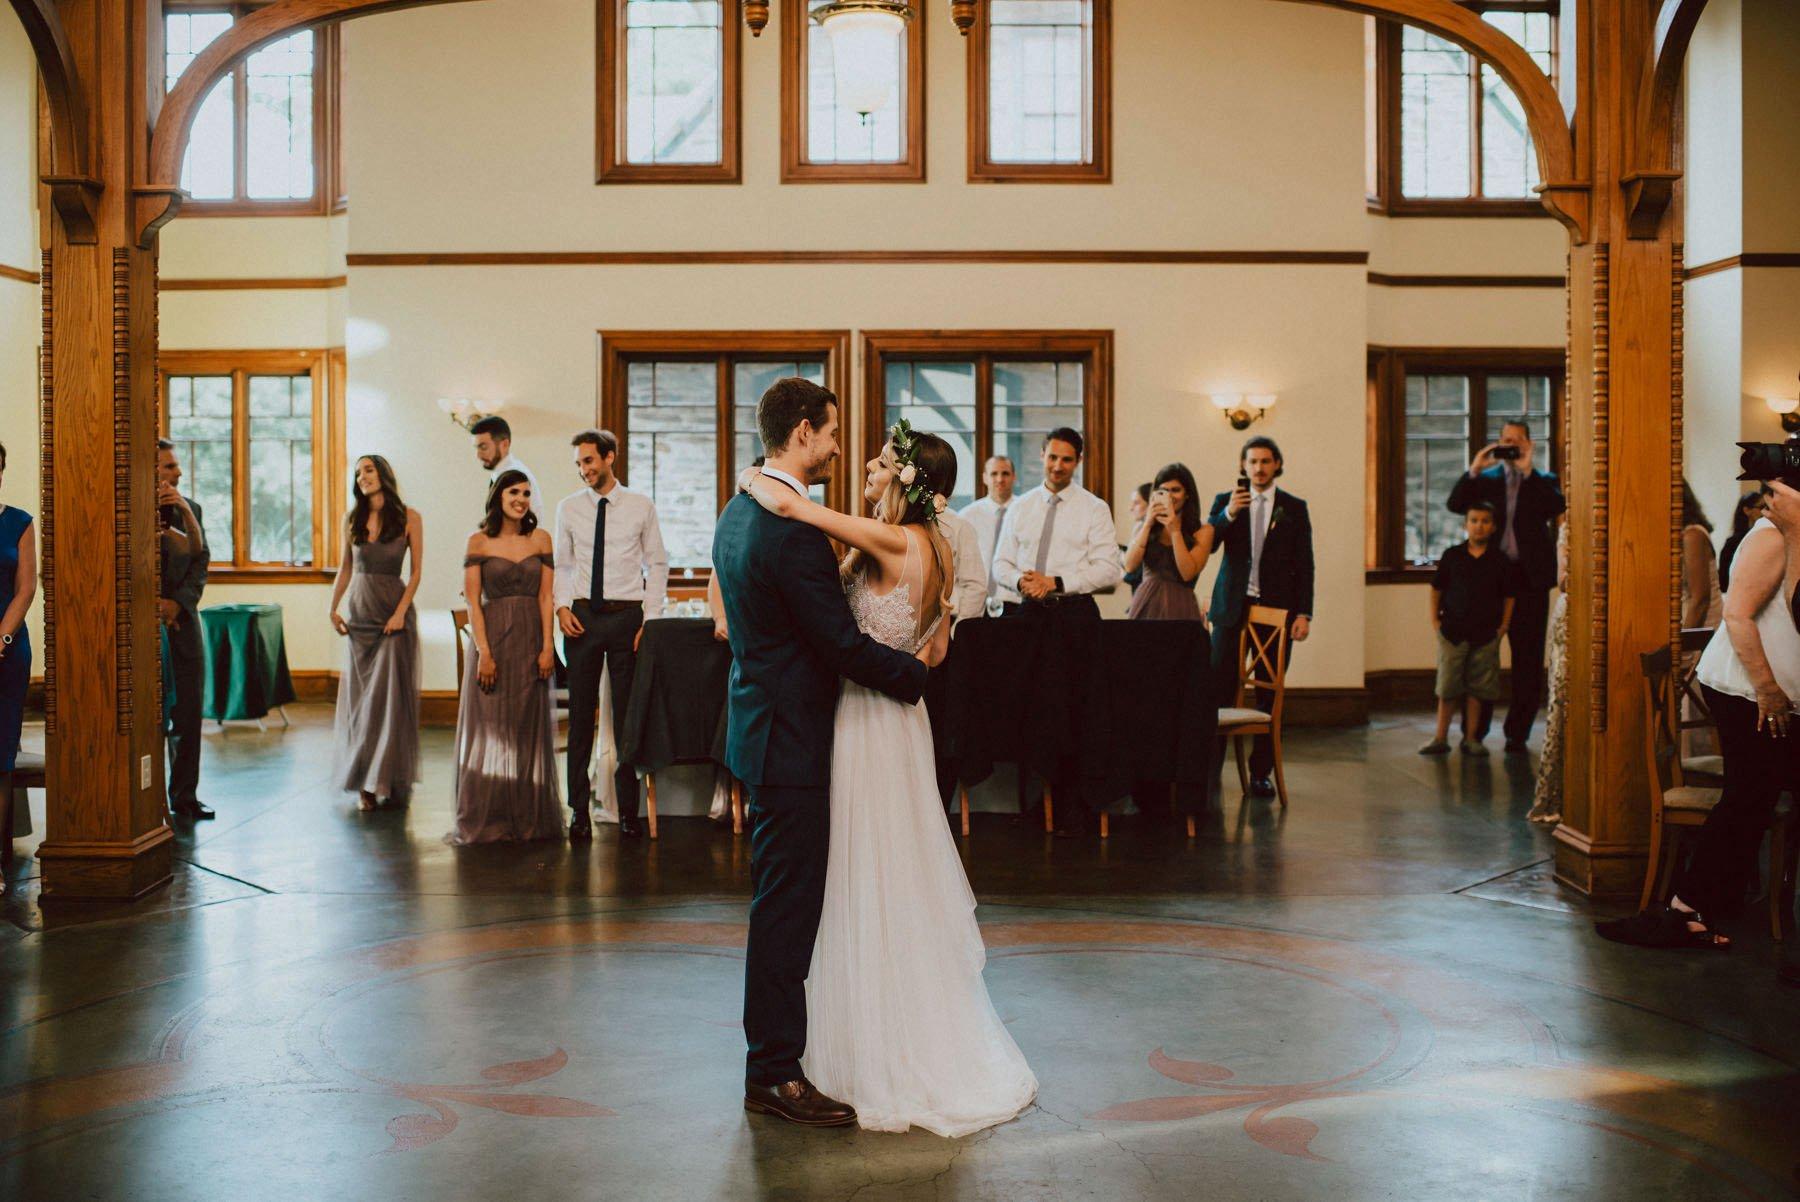 Knowlton-mansion-wedding-121.jpg